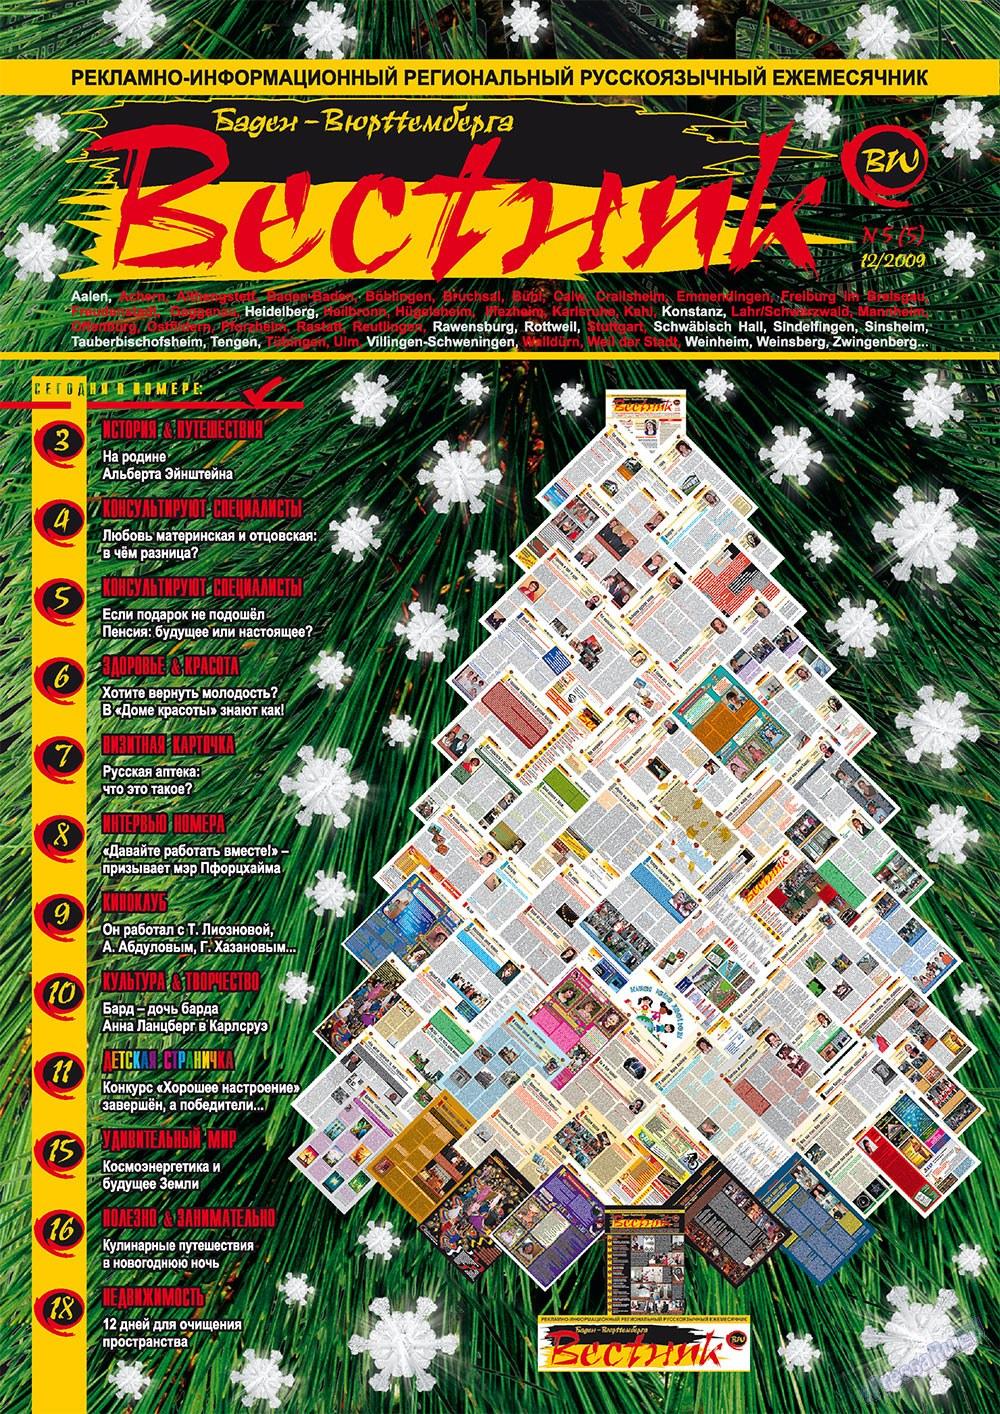 Вестник-info (журнал). 2009 год, номер 5, стр. 1